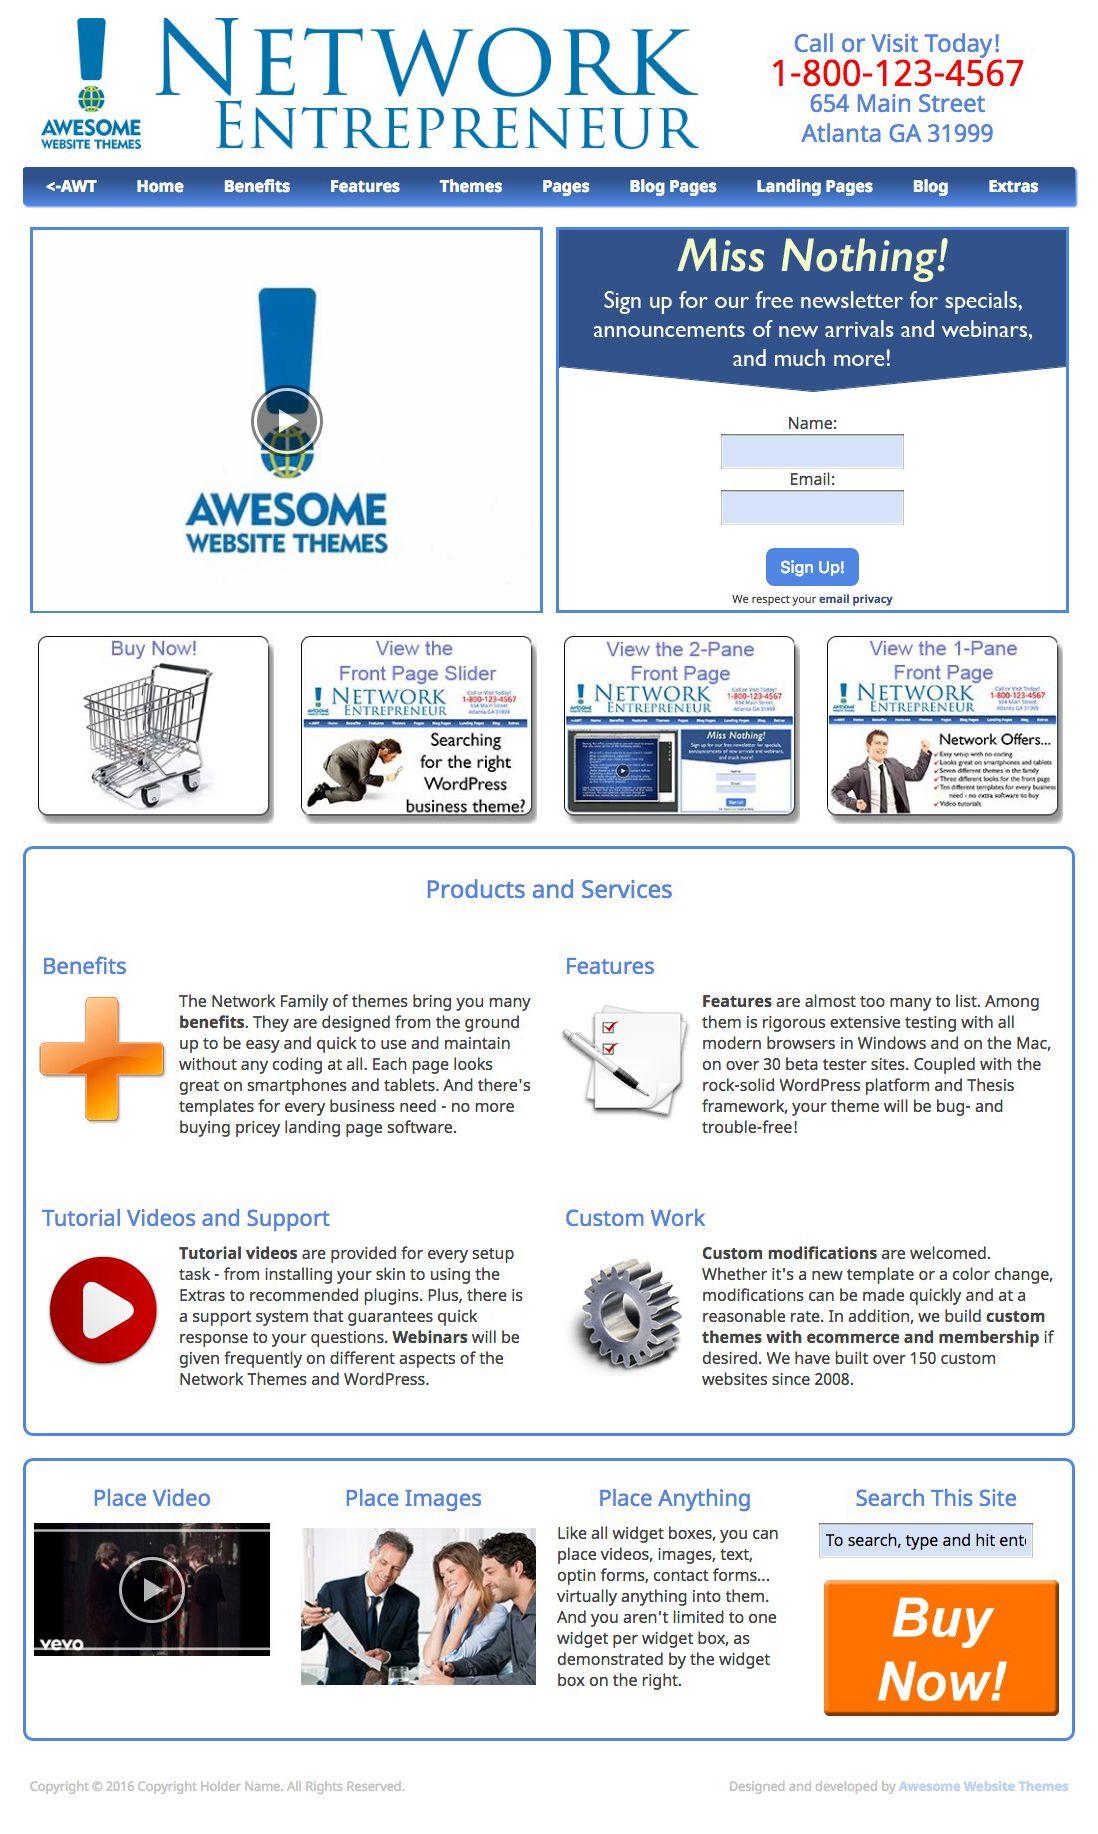 Thesis – a WordPress Theme Design Worth Considering